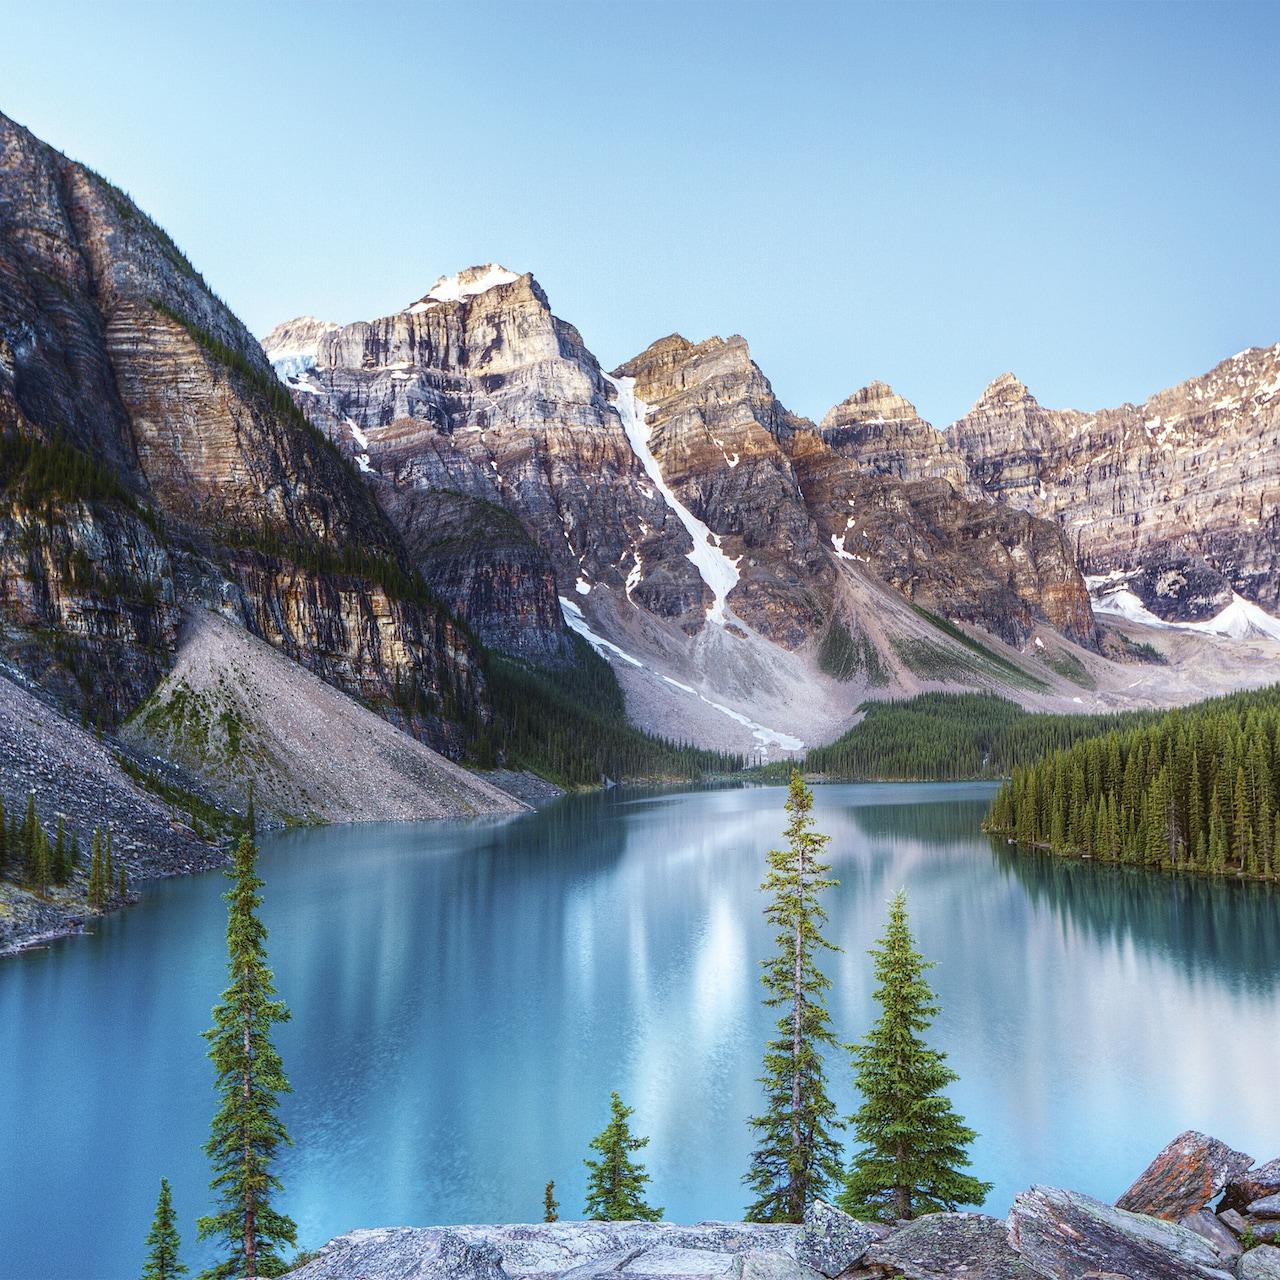 Moraine Lake flows through the glacial mountain peaks of Banff National Park